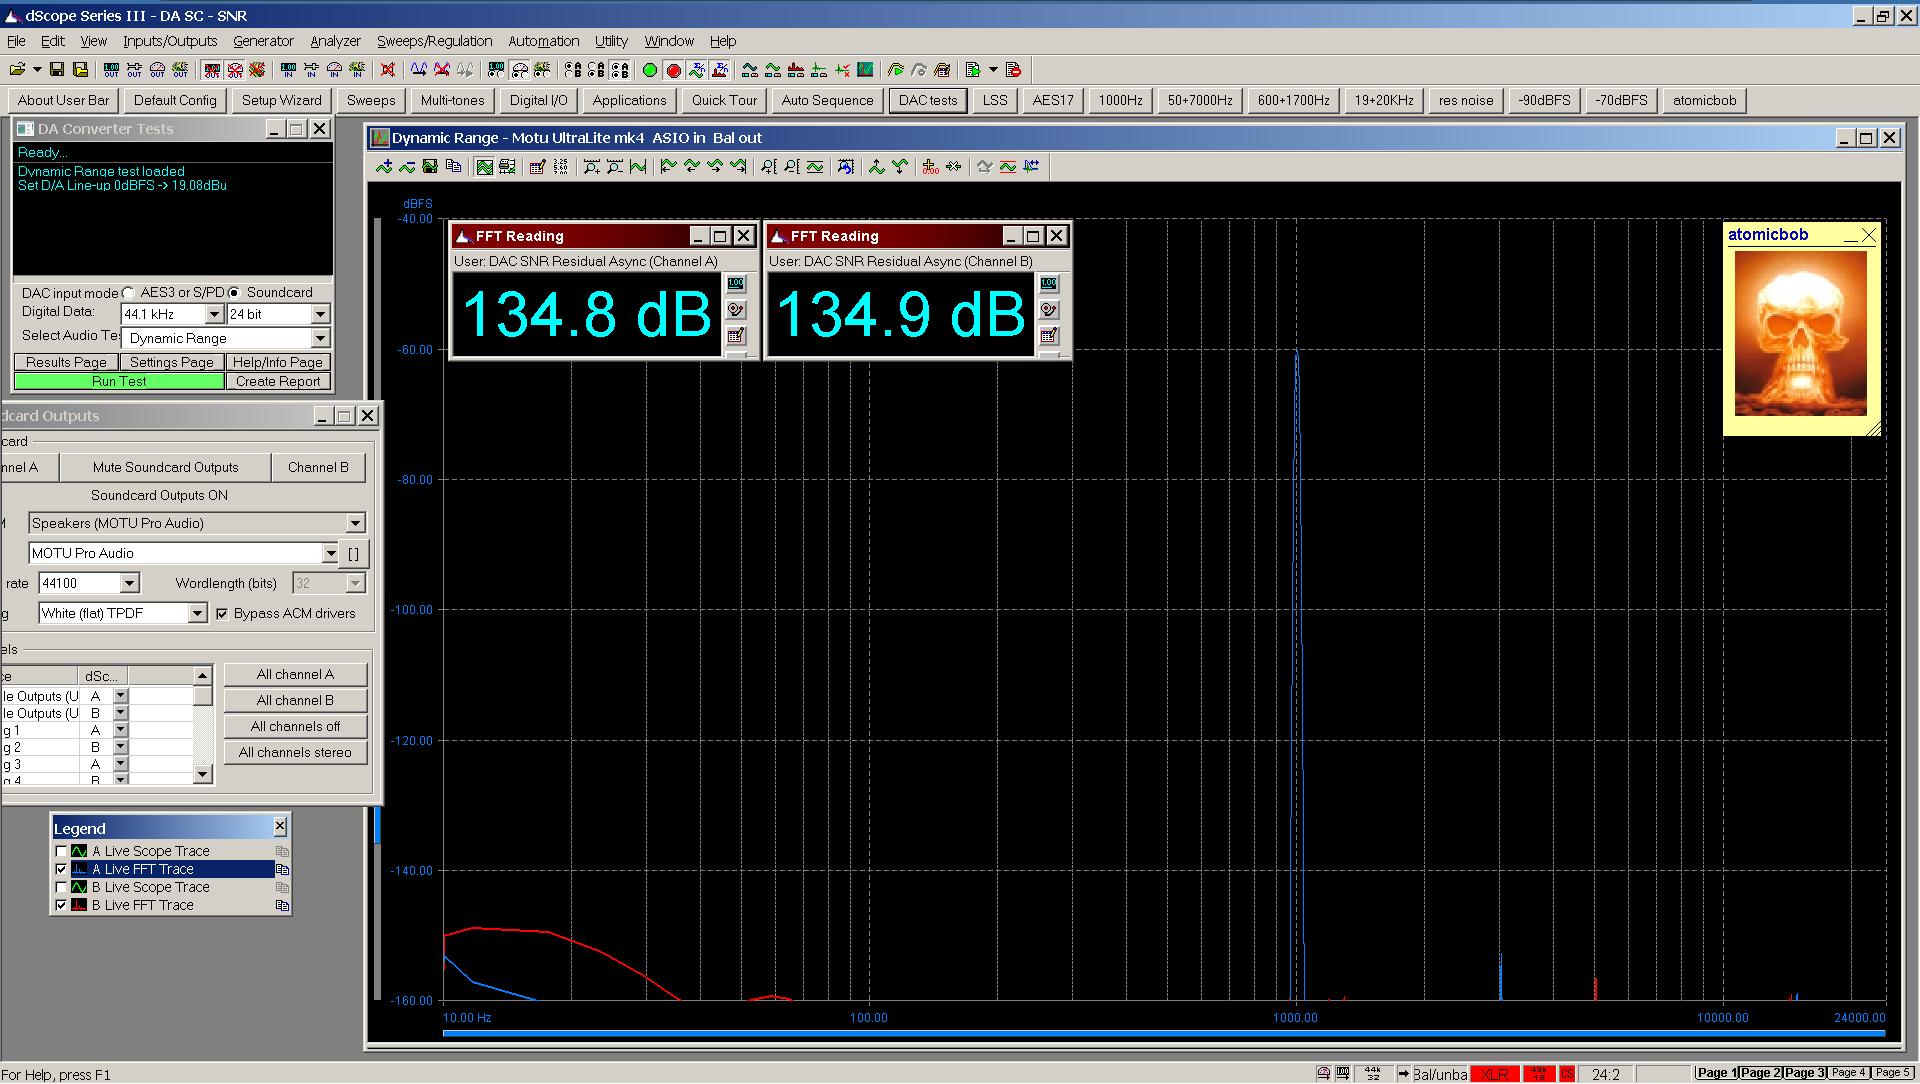 20200523-00 UltraLite-mk4 dynamic range FFT ASIO Bal.png